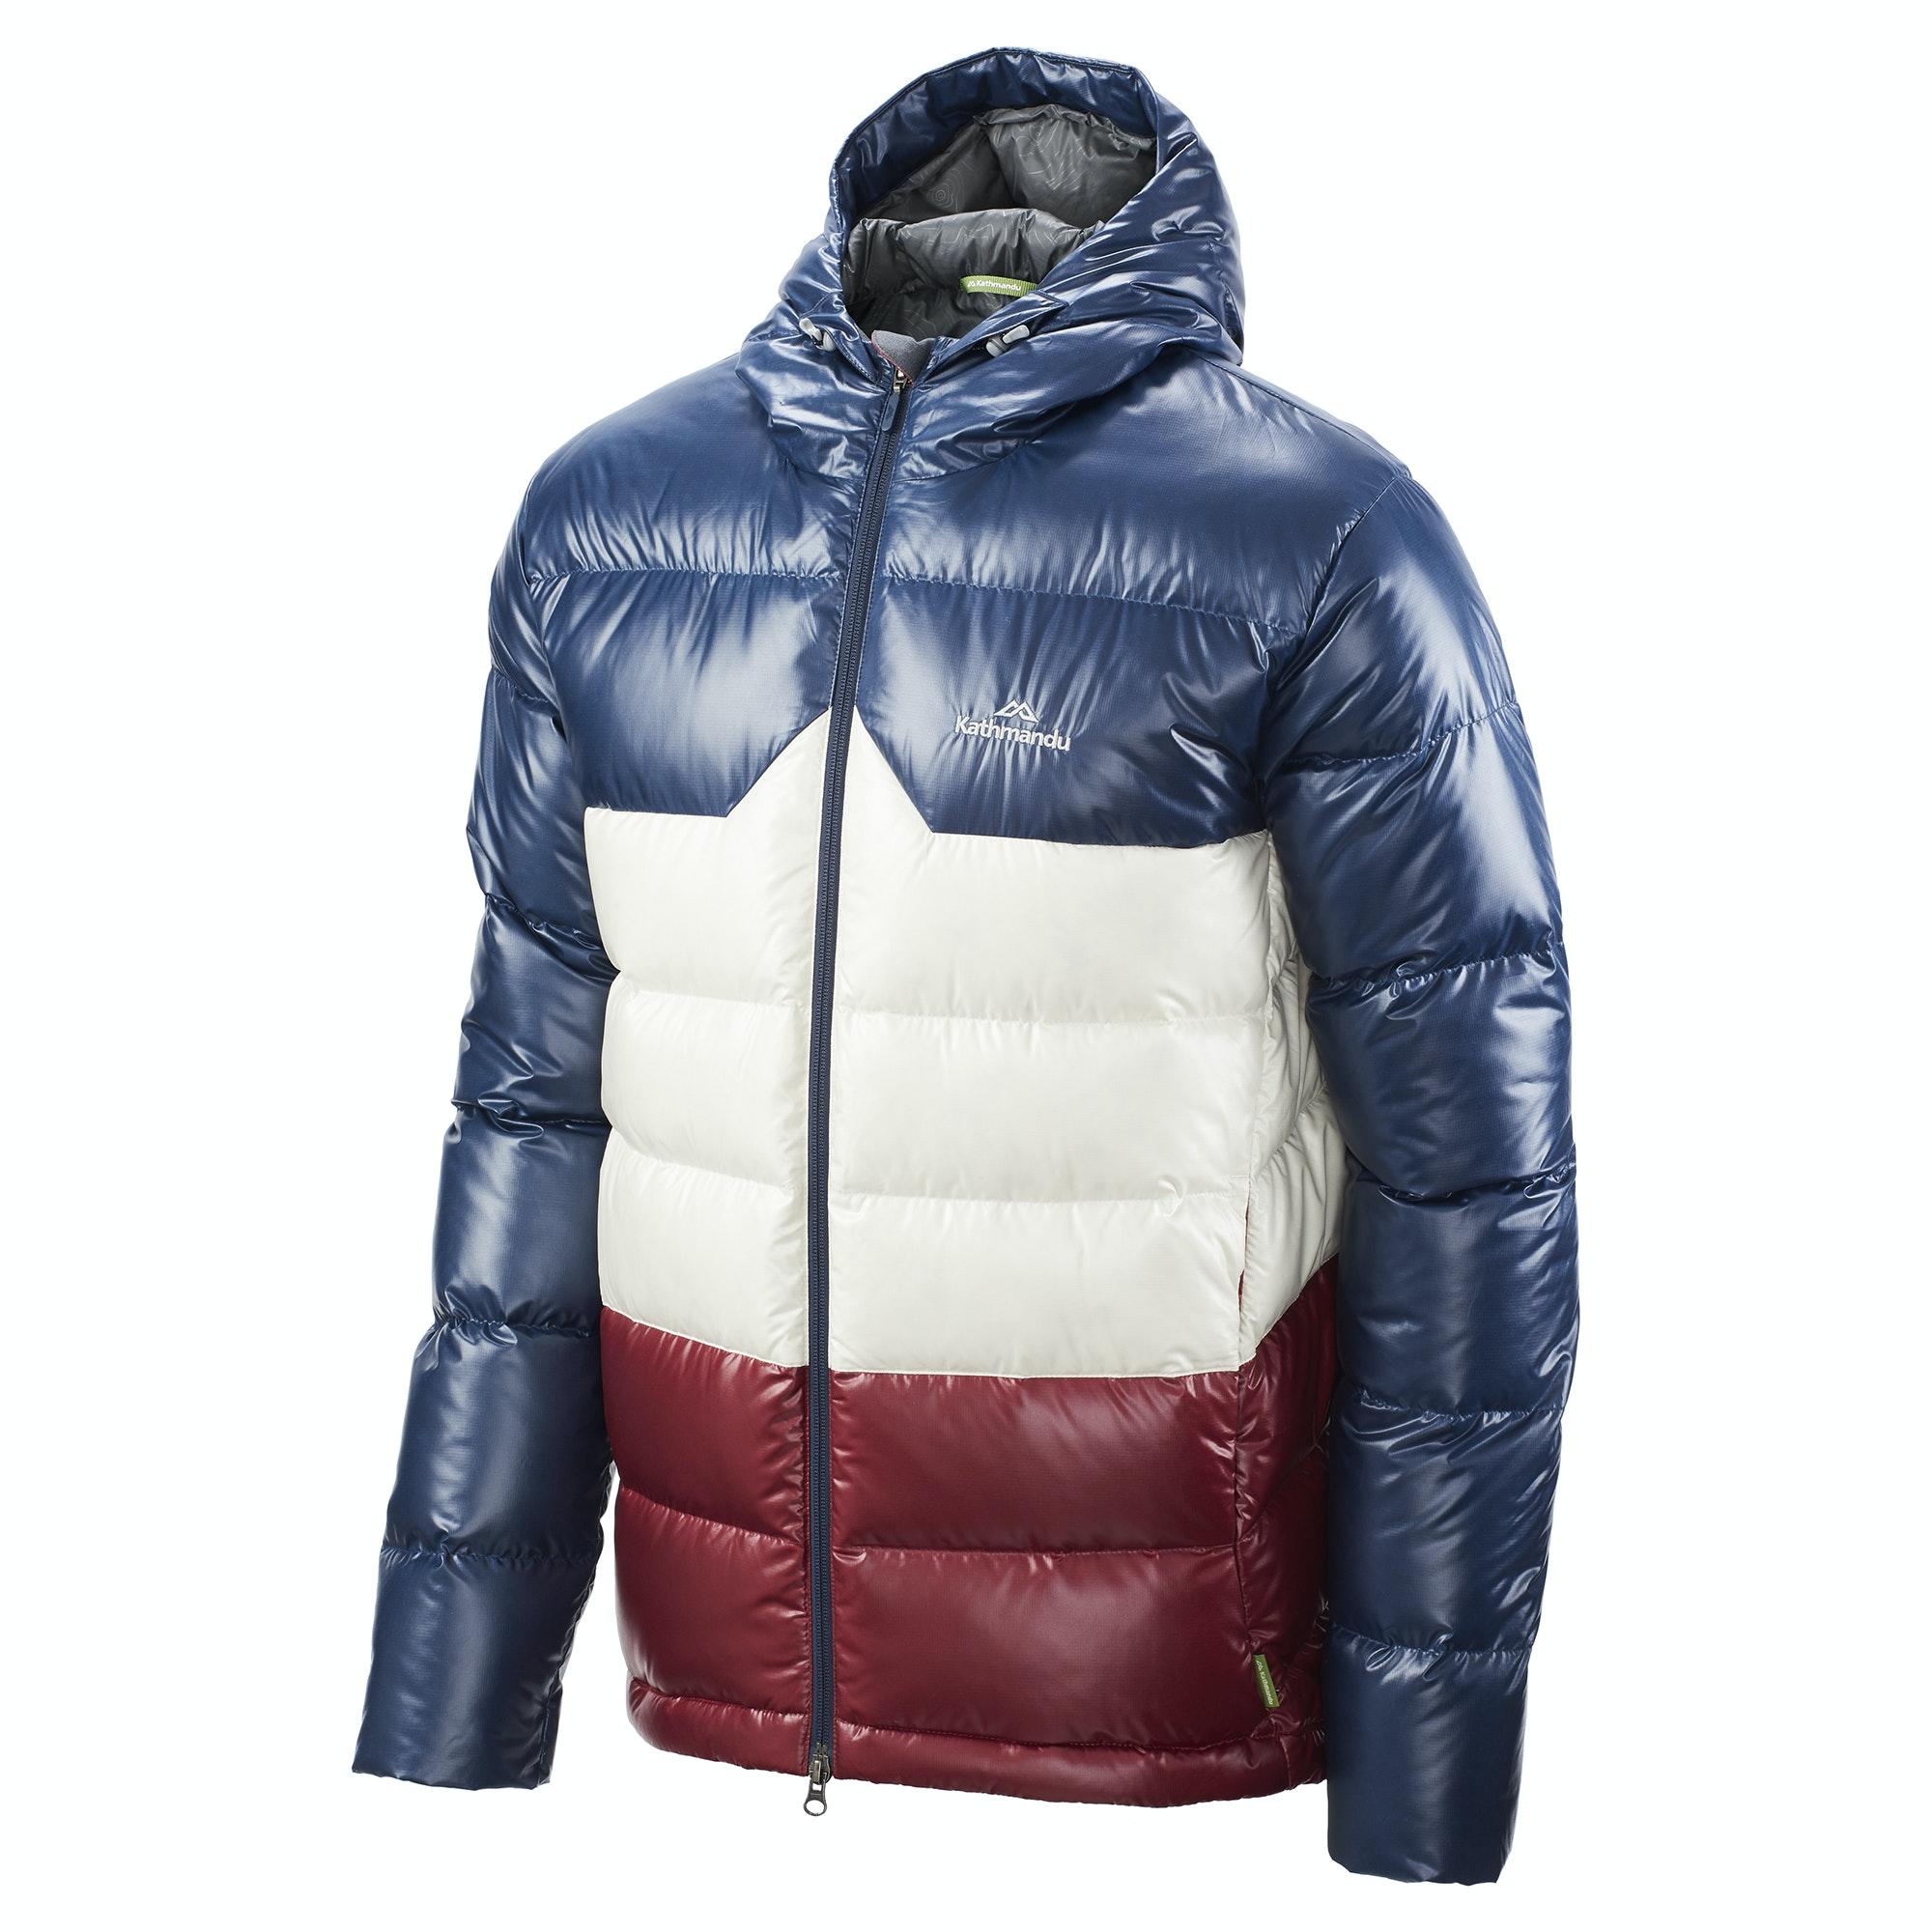 NEW-Kathmandu-Epiq-Men-039-s-Hooded-Warm-Winter-Duck-Down-Puffer-Jacket-v2 thumbnail 16